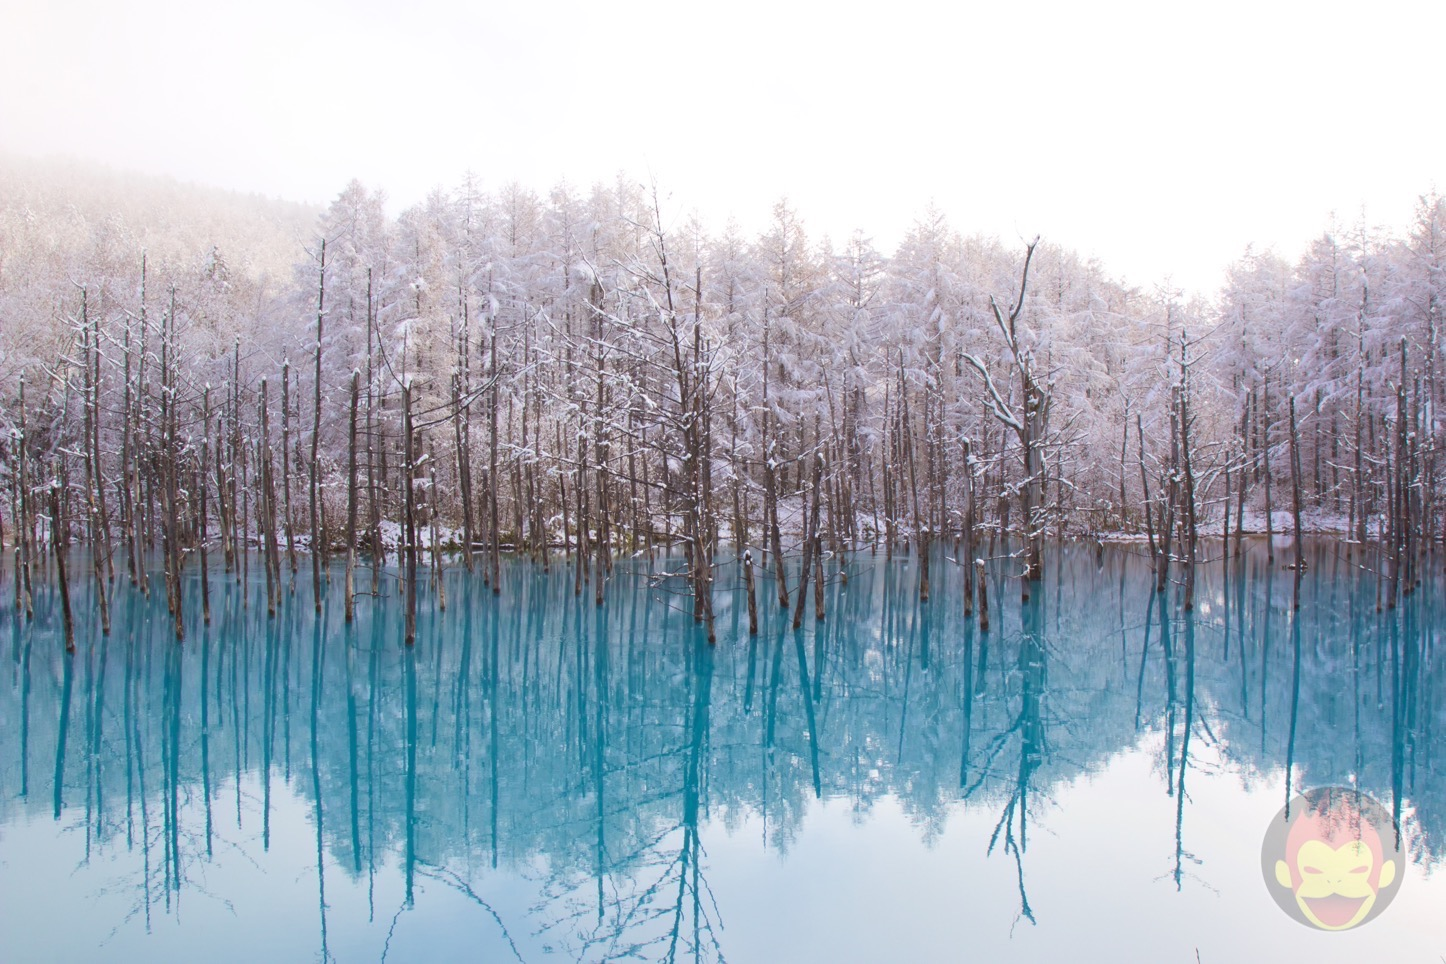 Macの壁紙でお馴染み 美瑛町にある 青い池 の美しさに見惚れた